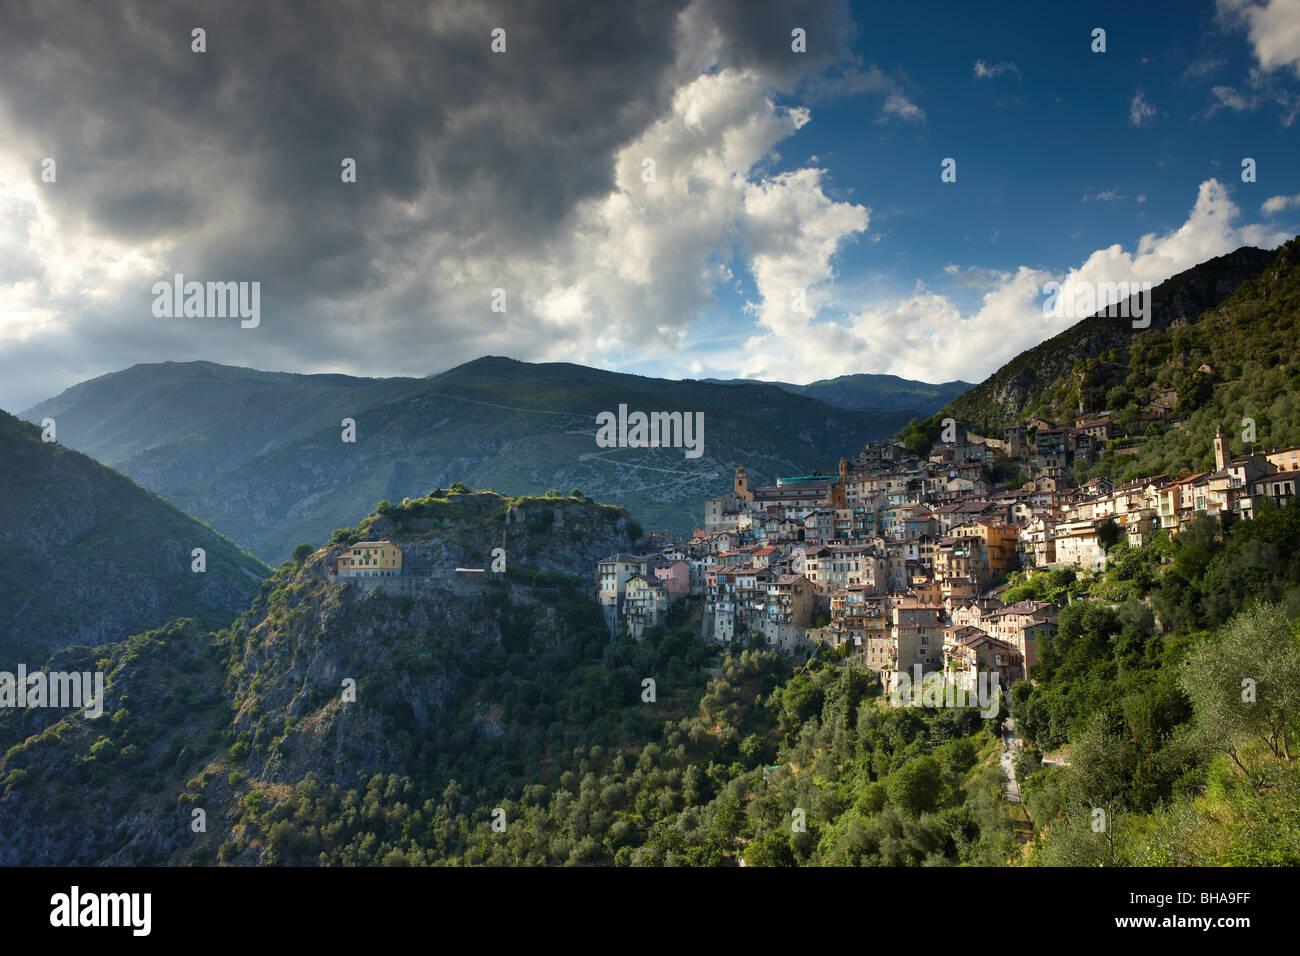 Saorge, Alpes Maritime, Provence, France - Stock Image